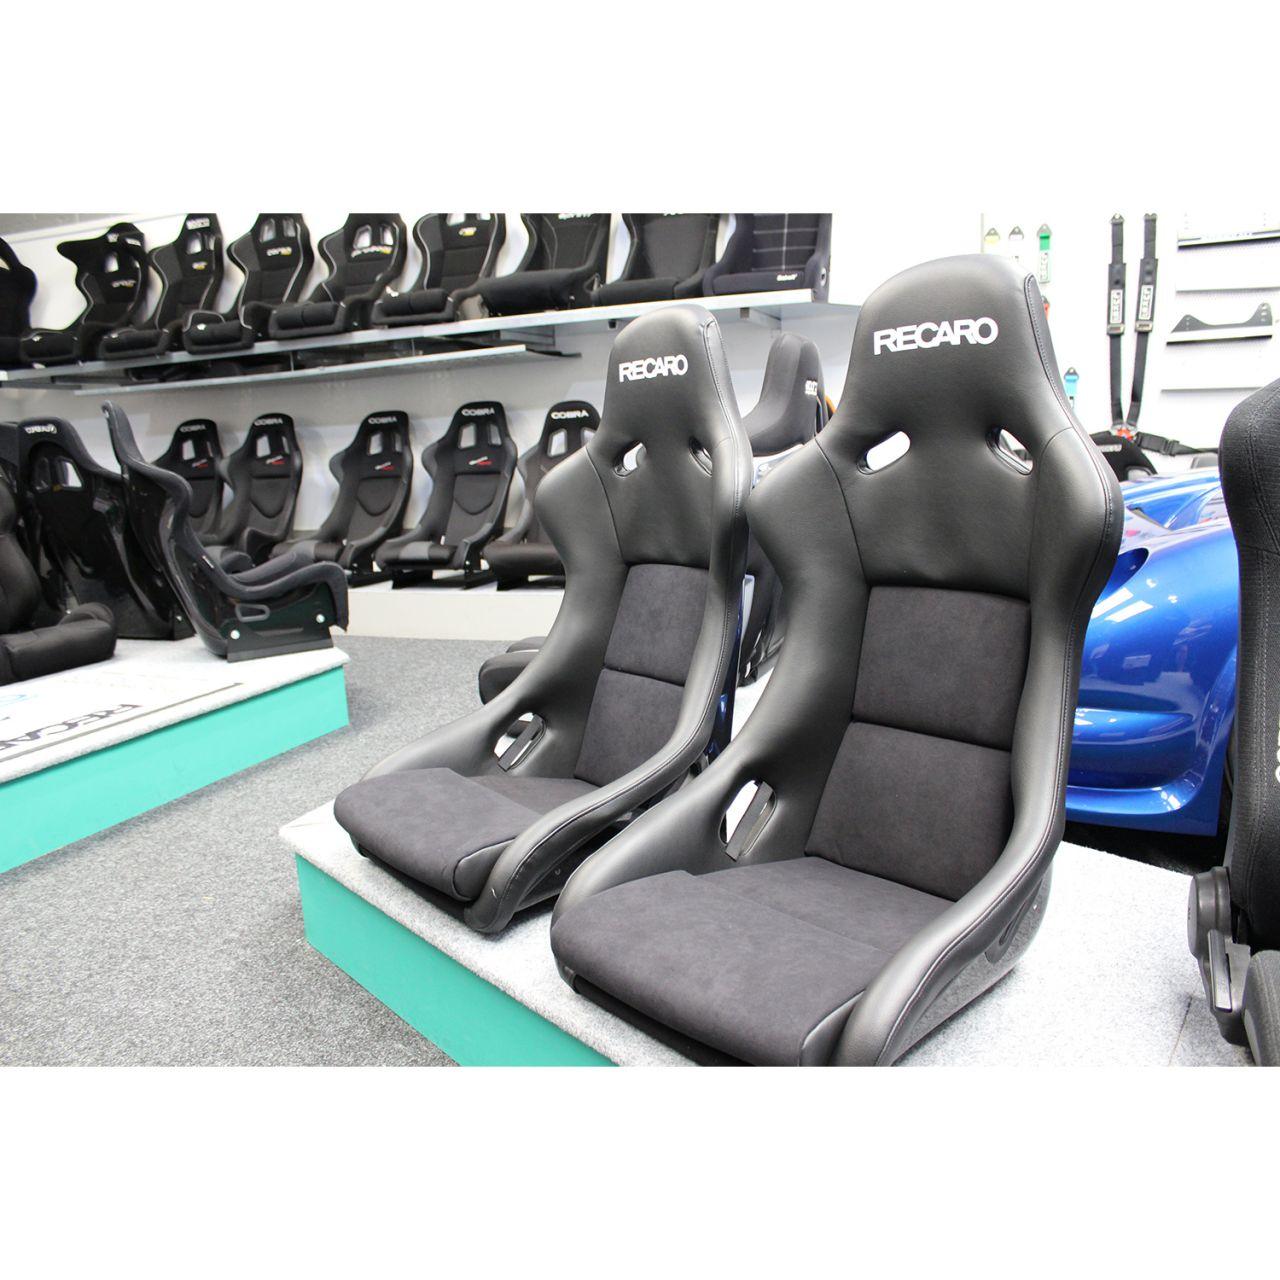 Recaro Seats Pole Position with ABE Bucket Seat - GSM ...